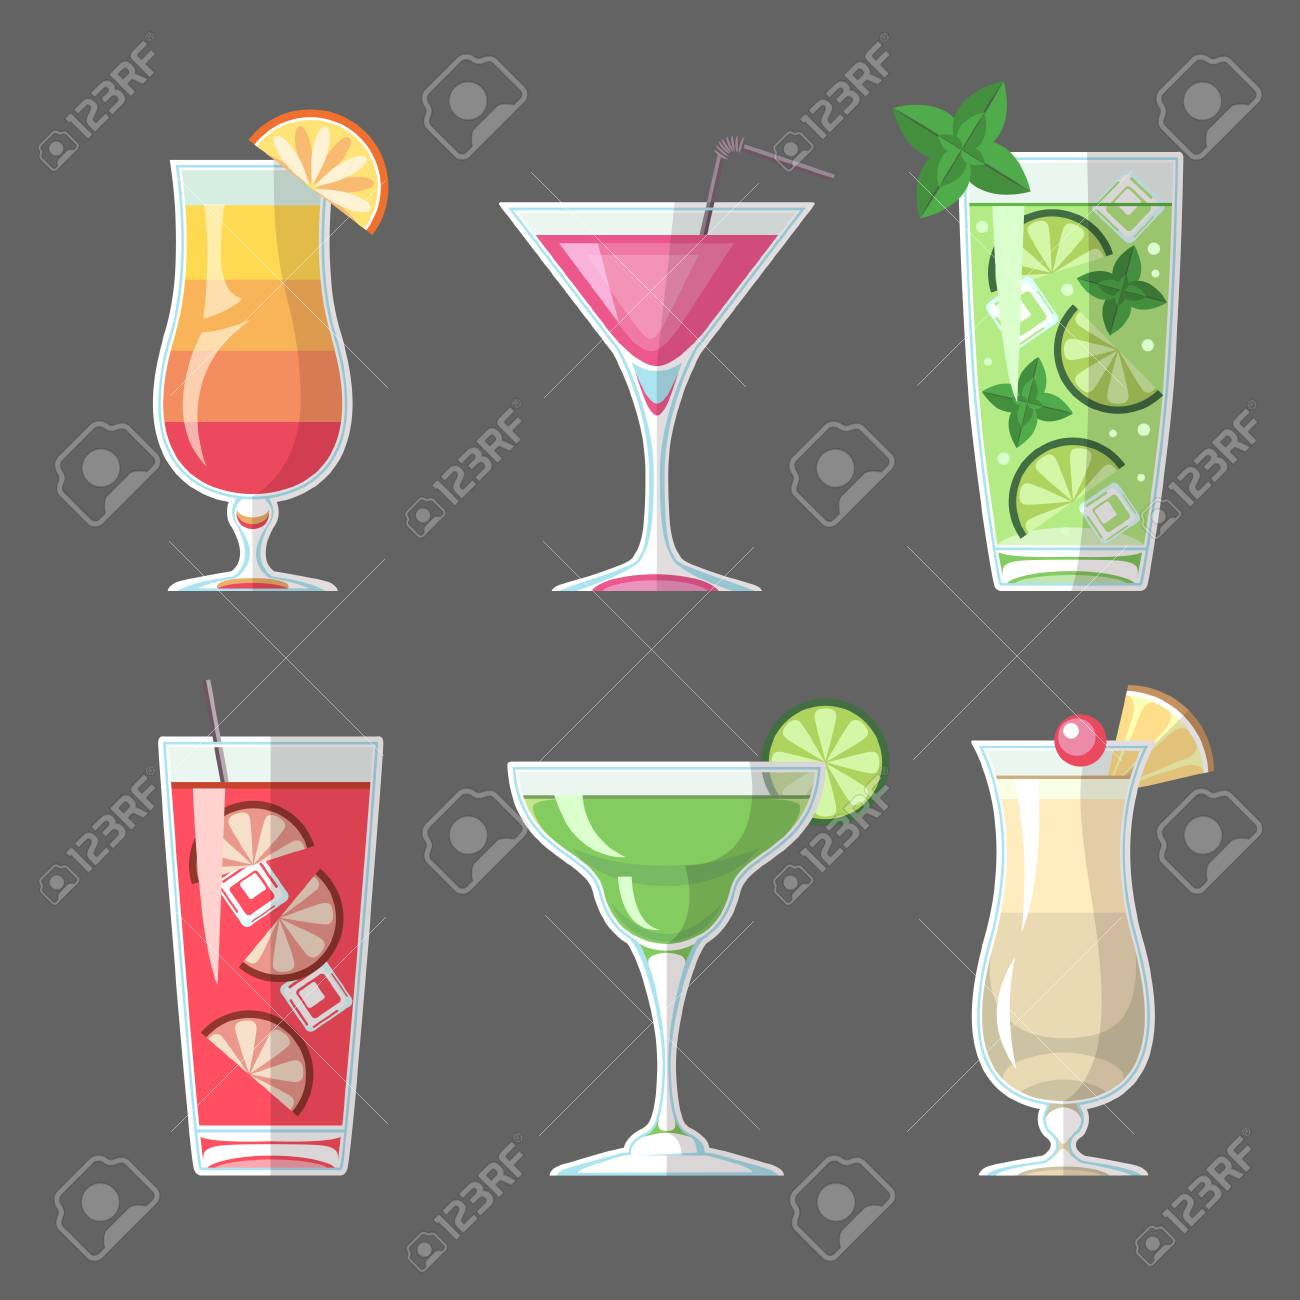 Flat style cocktail menu design - 98880305